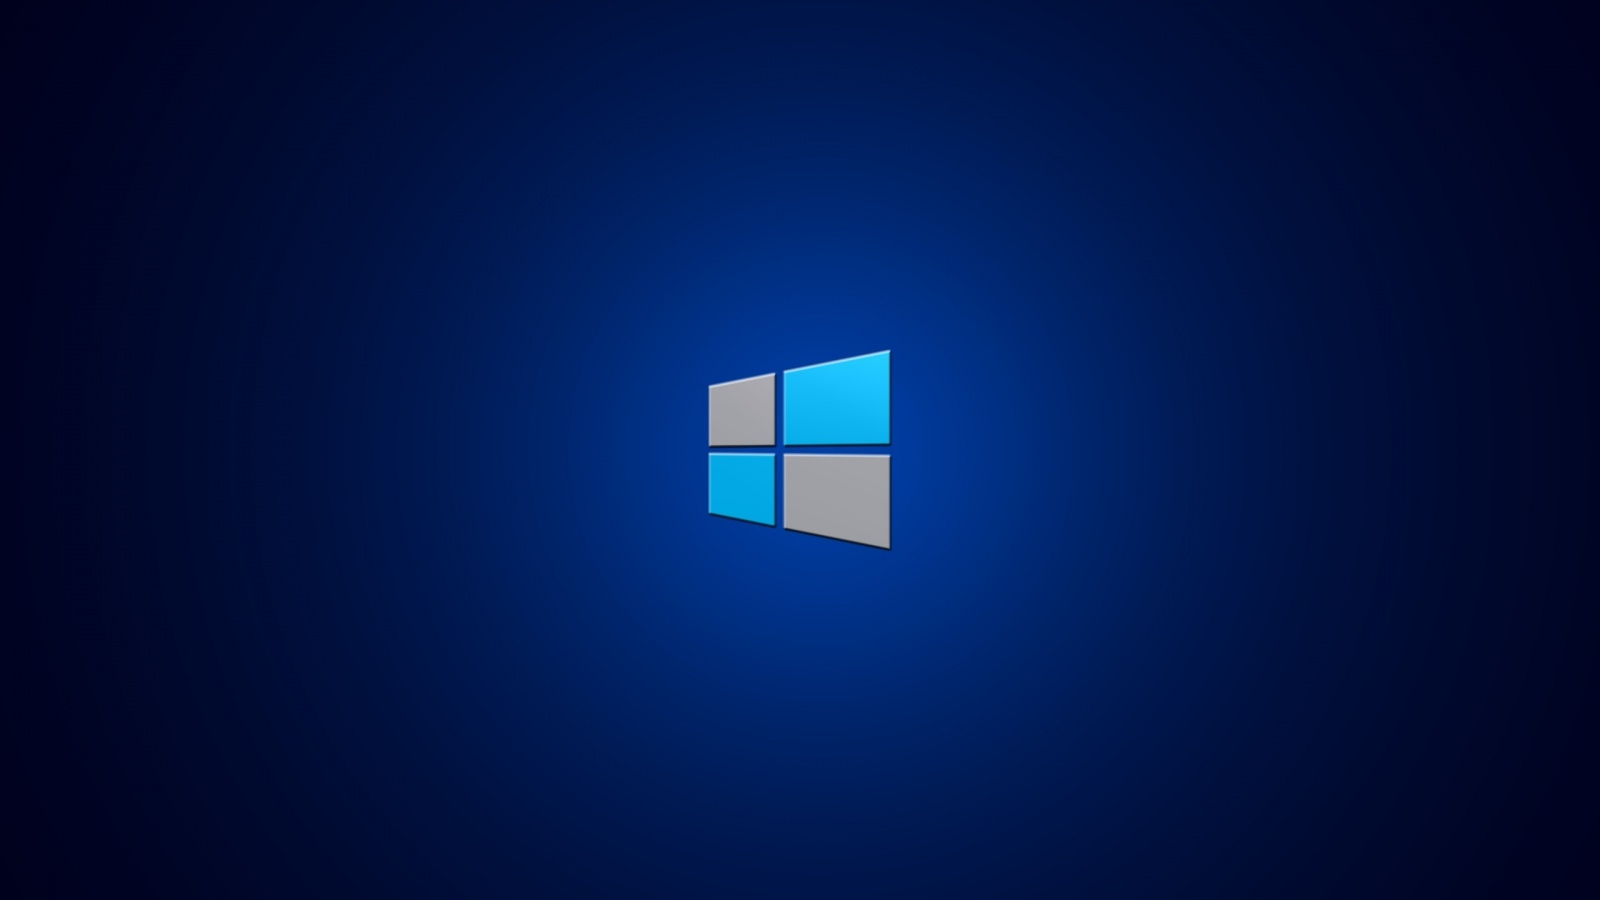 Windows Xx